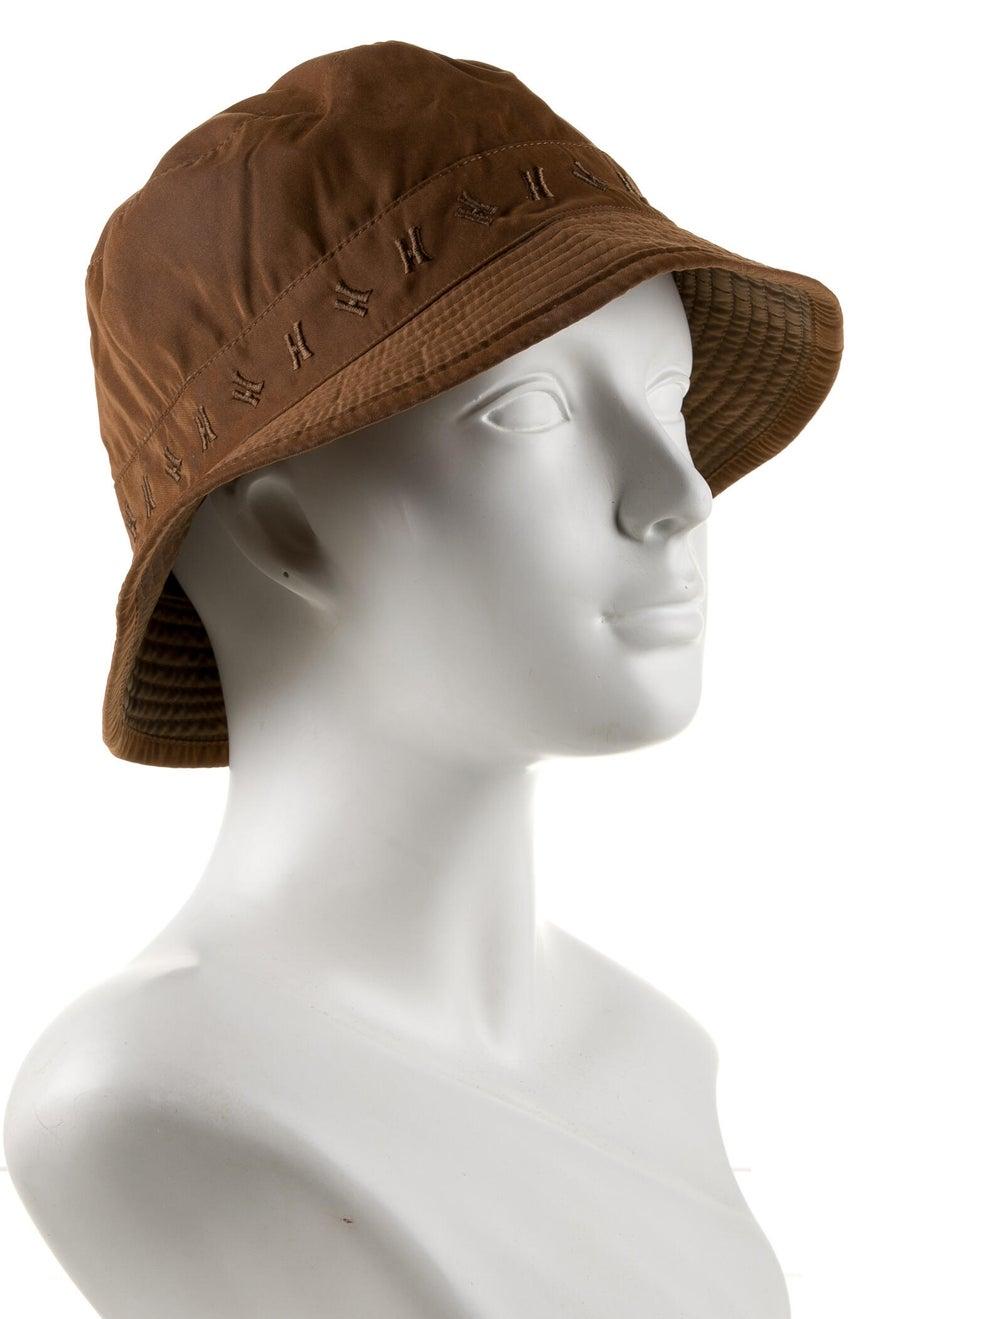 Hermès Logo Woven Bucket Hat Brown - image 3